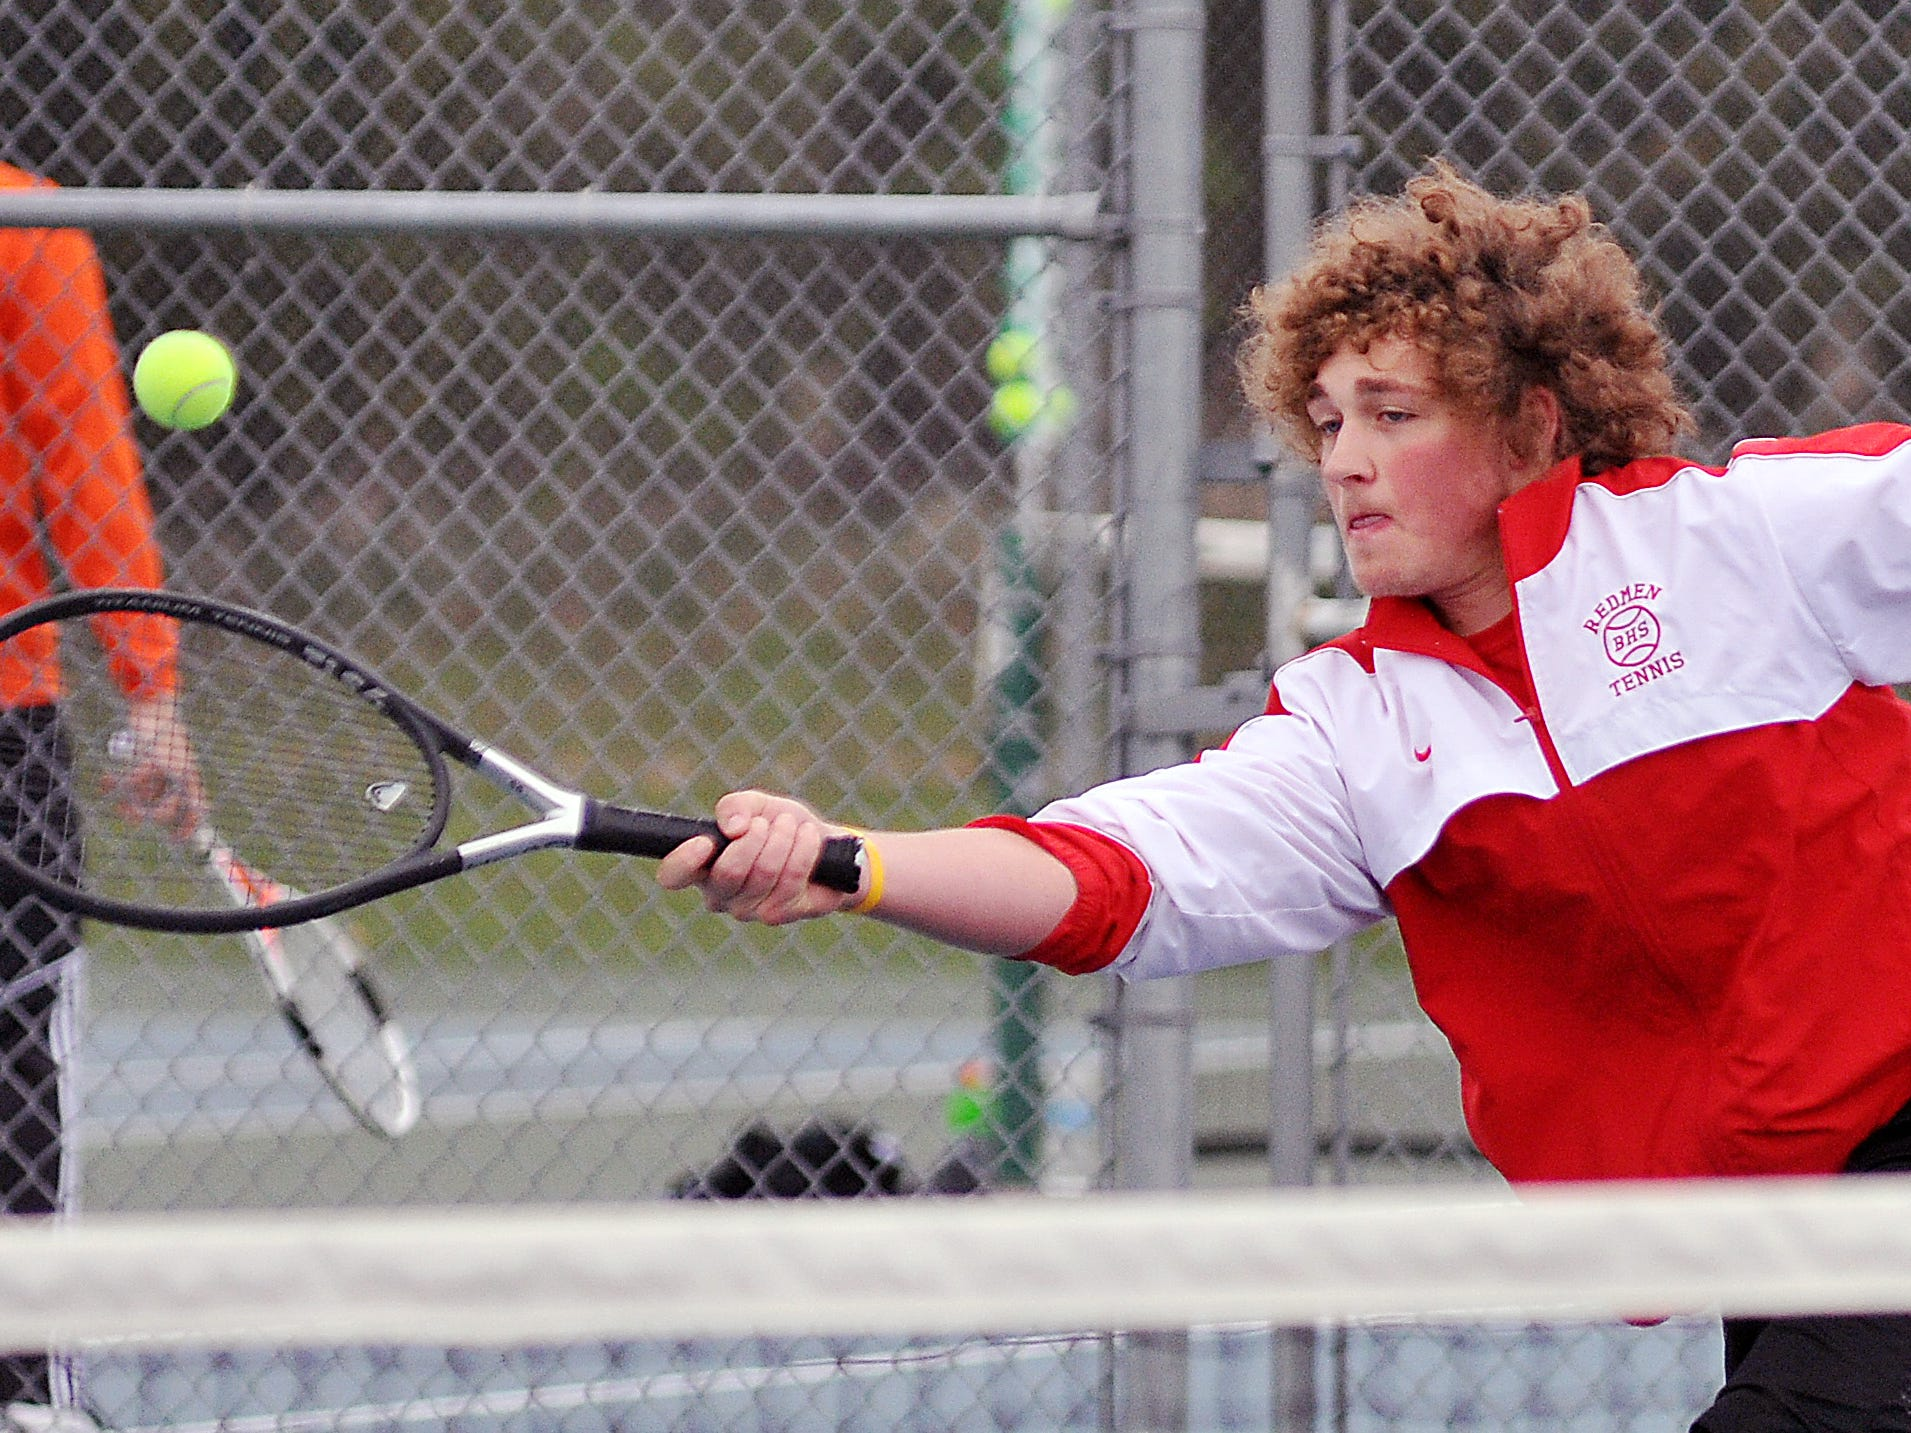 Bucyrus' Jarett Pollack returns during the Jim Grandy Boys Tennis Invite Saturday.